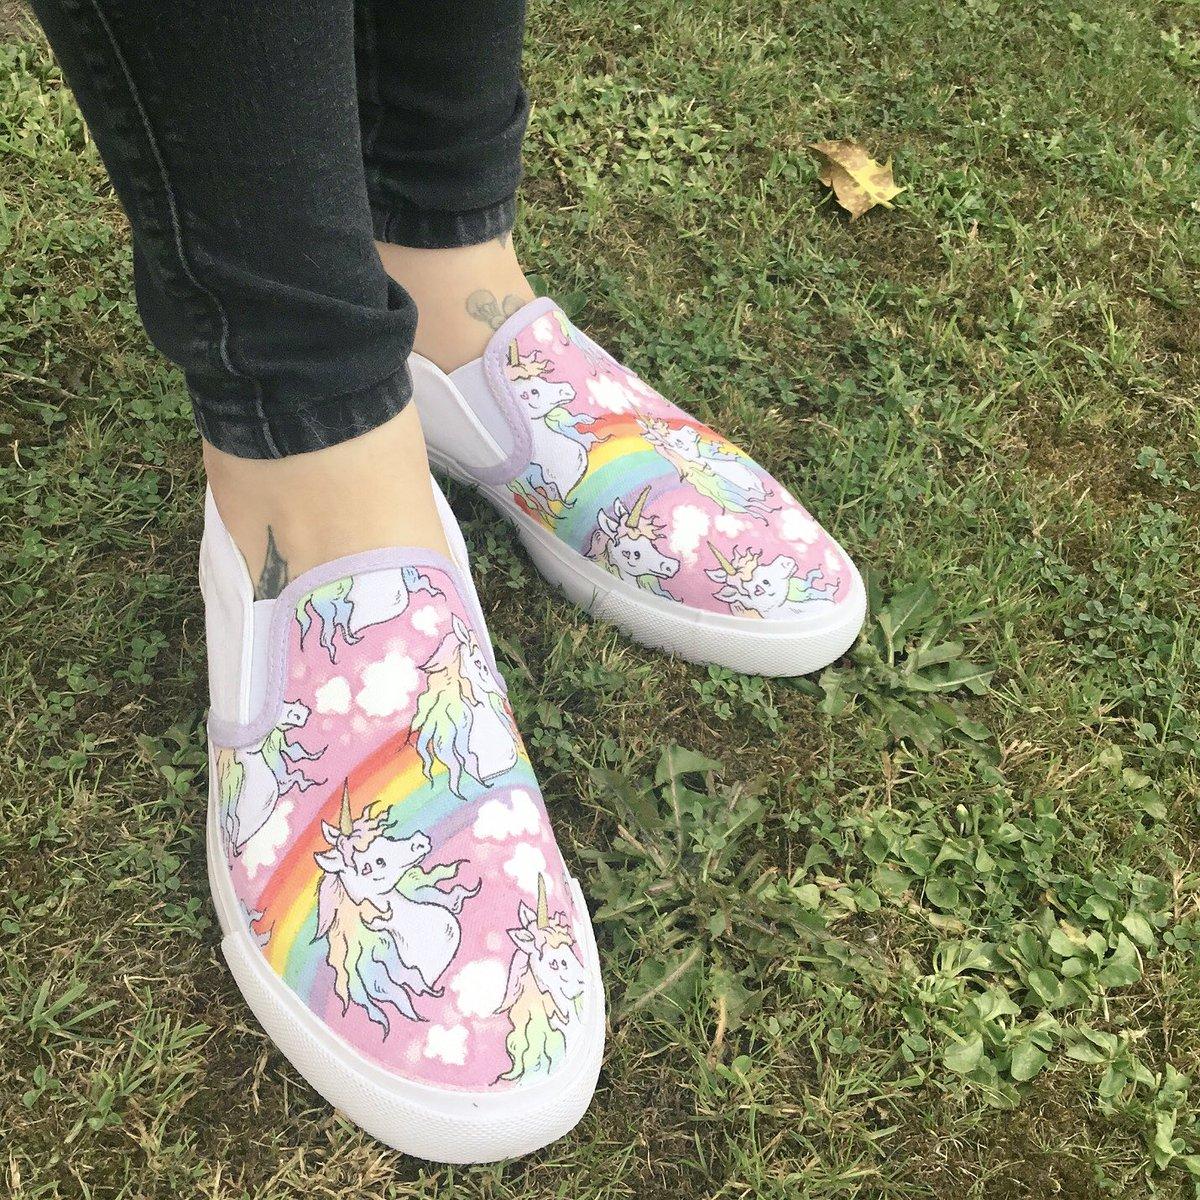 8aba3842234e78 Choose your own design. http   gemsville.etsy.com  art  illustration   shoeart  sneakers  fashion  footwear  ooak  custommade  customshoes   colourful ...